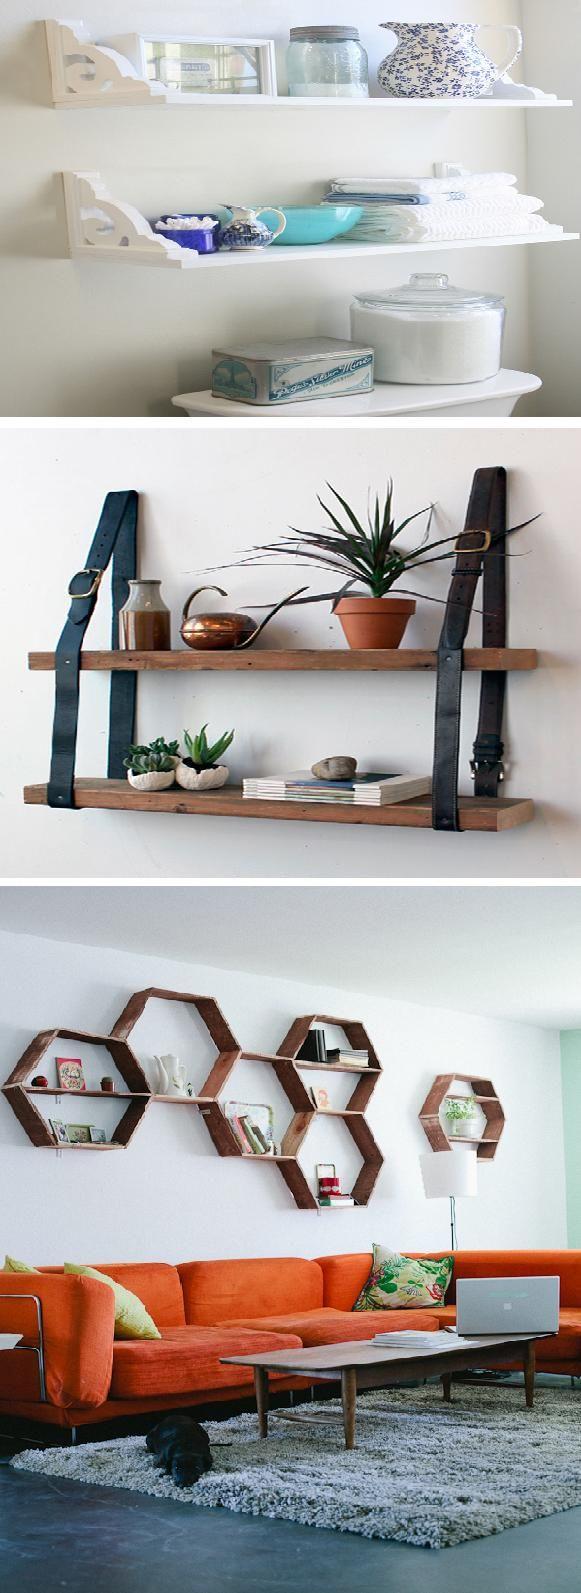 DIY bathroom shelves | diy craft TUTORIALS